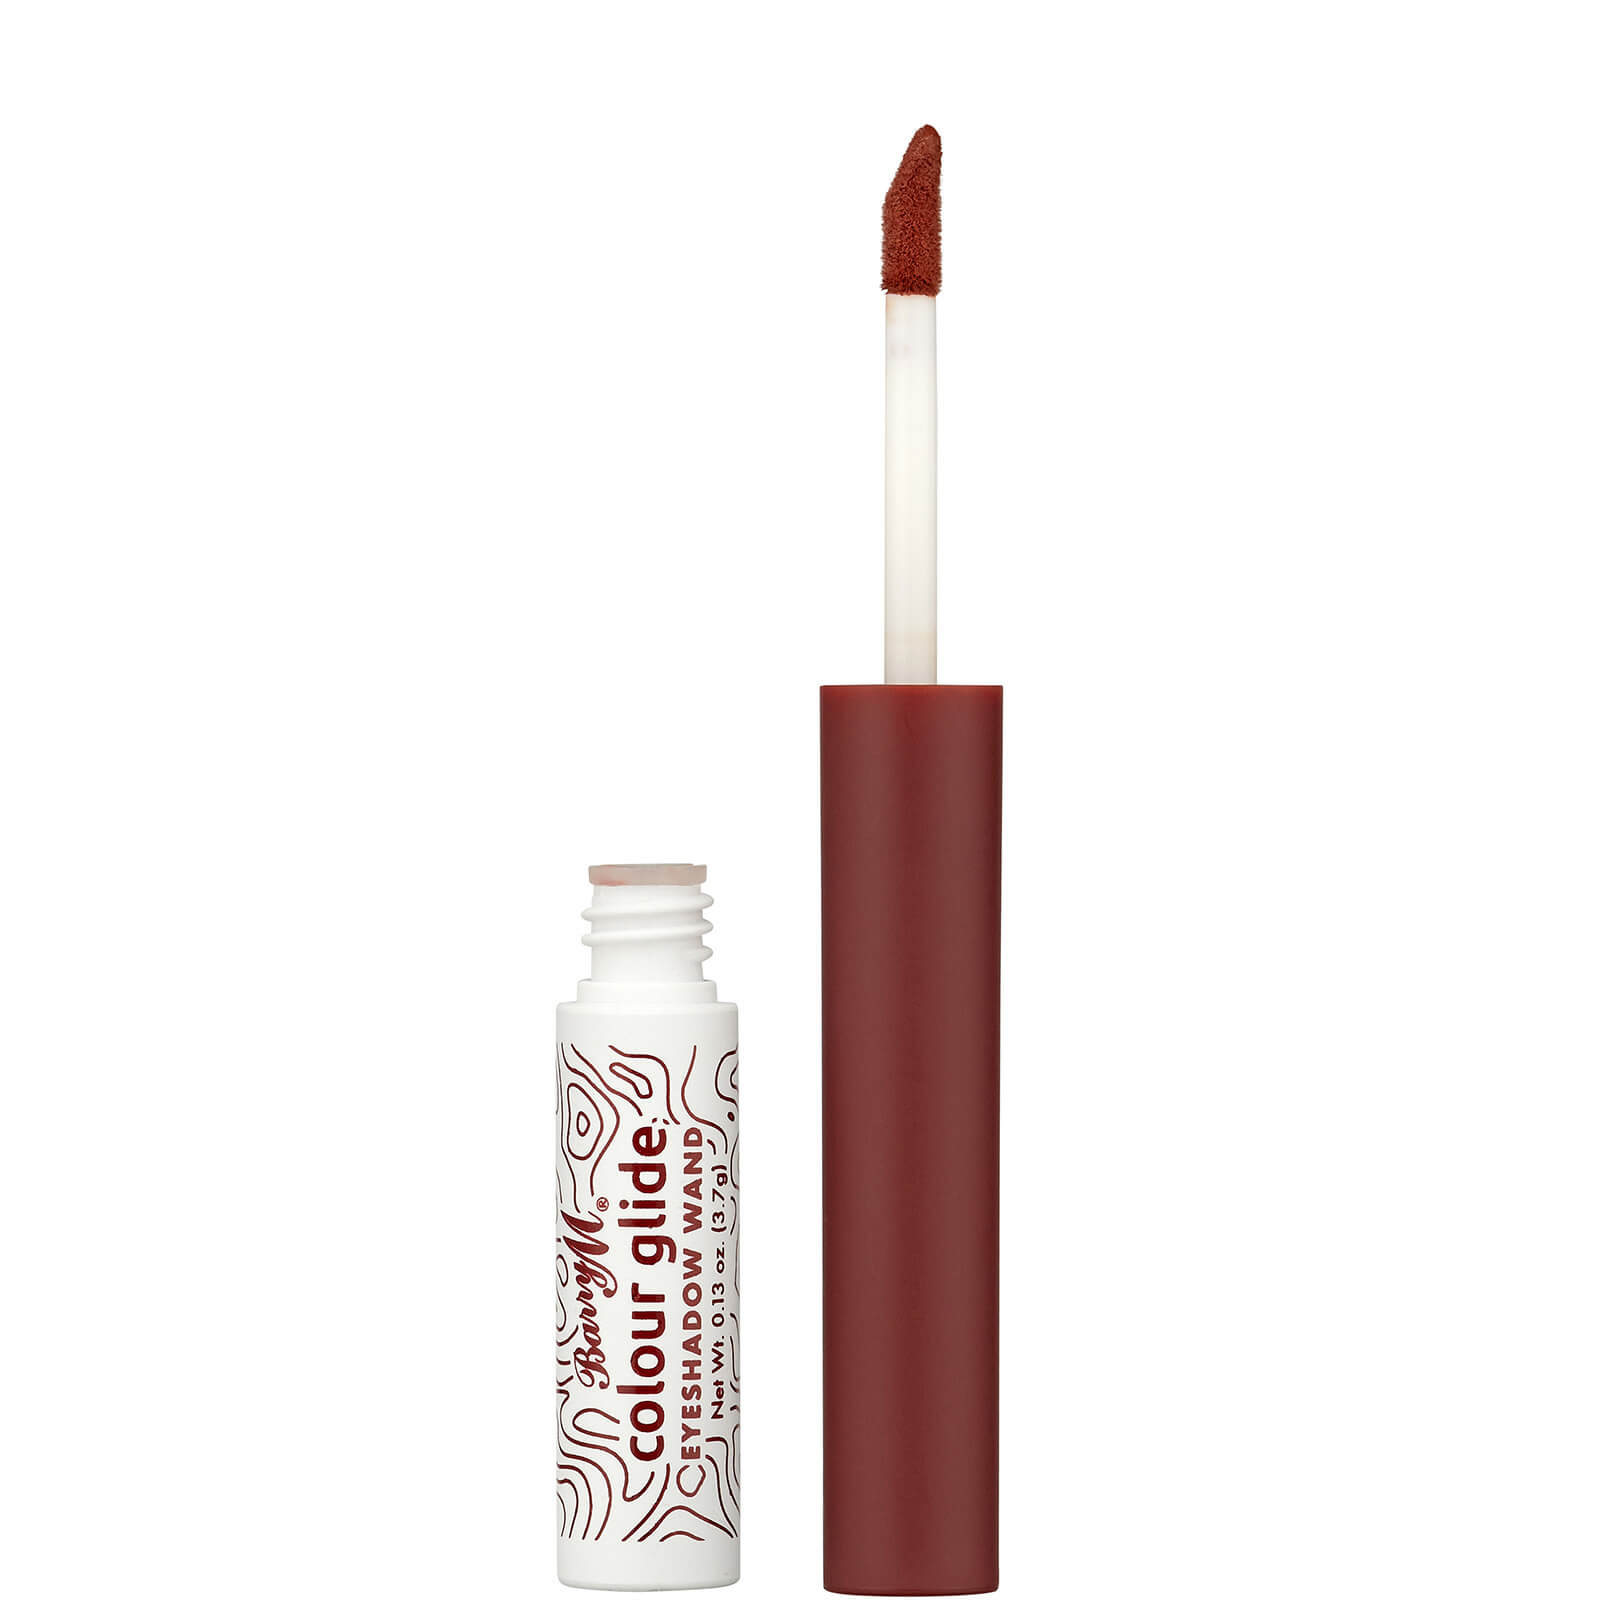 Купить Barry M Cosmetics Colour Glide Eyeshadow Wand 3.7ml (Various Shades) - Sun Setter